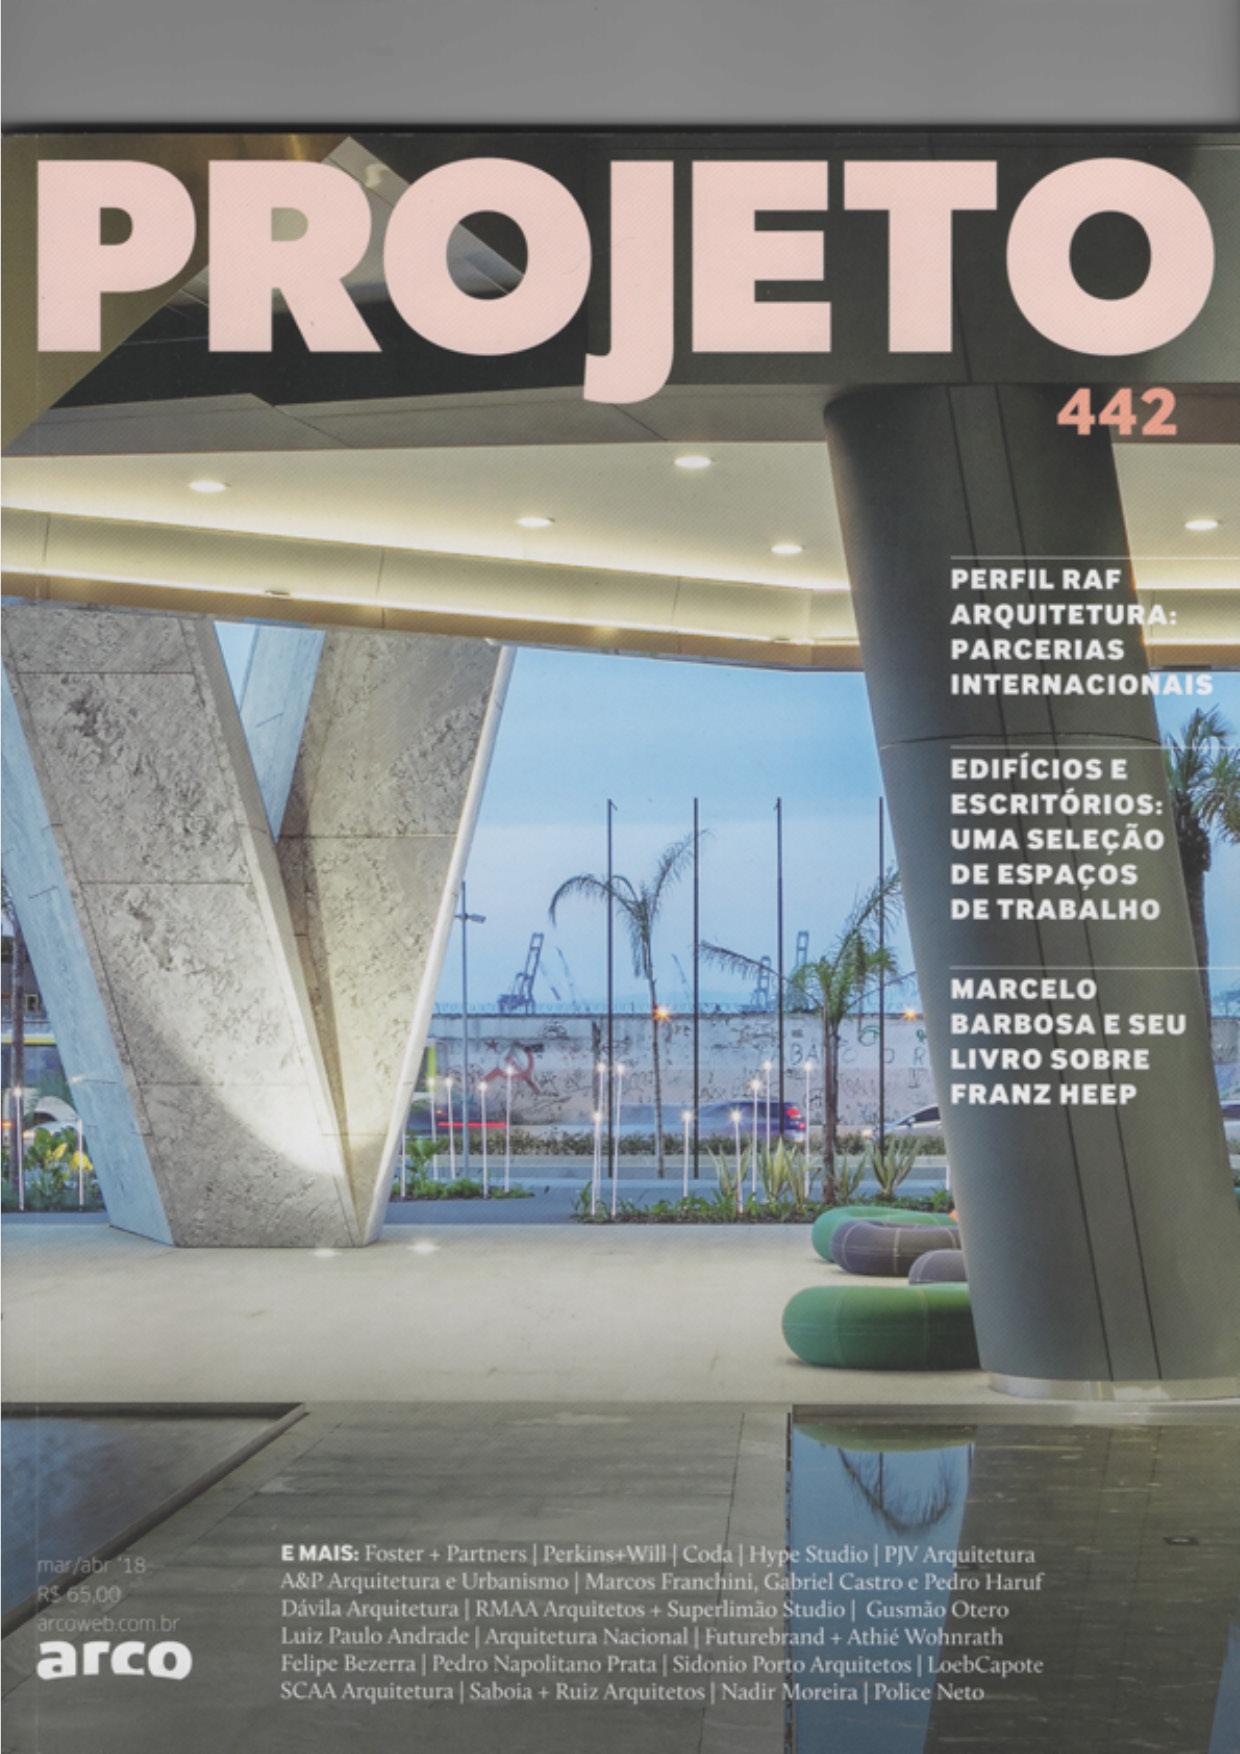 Projeto ed. 442 | Imapct HUB - março 2018